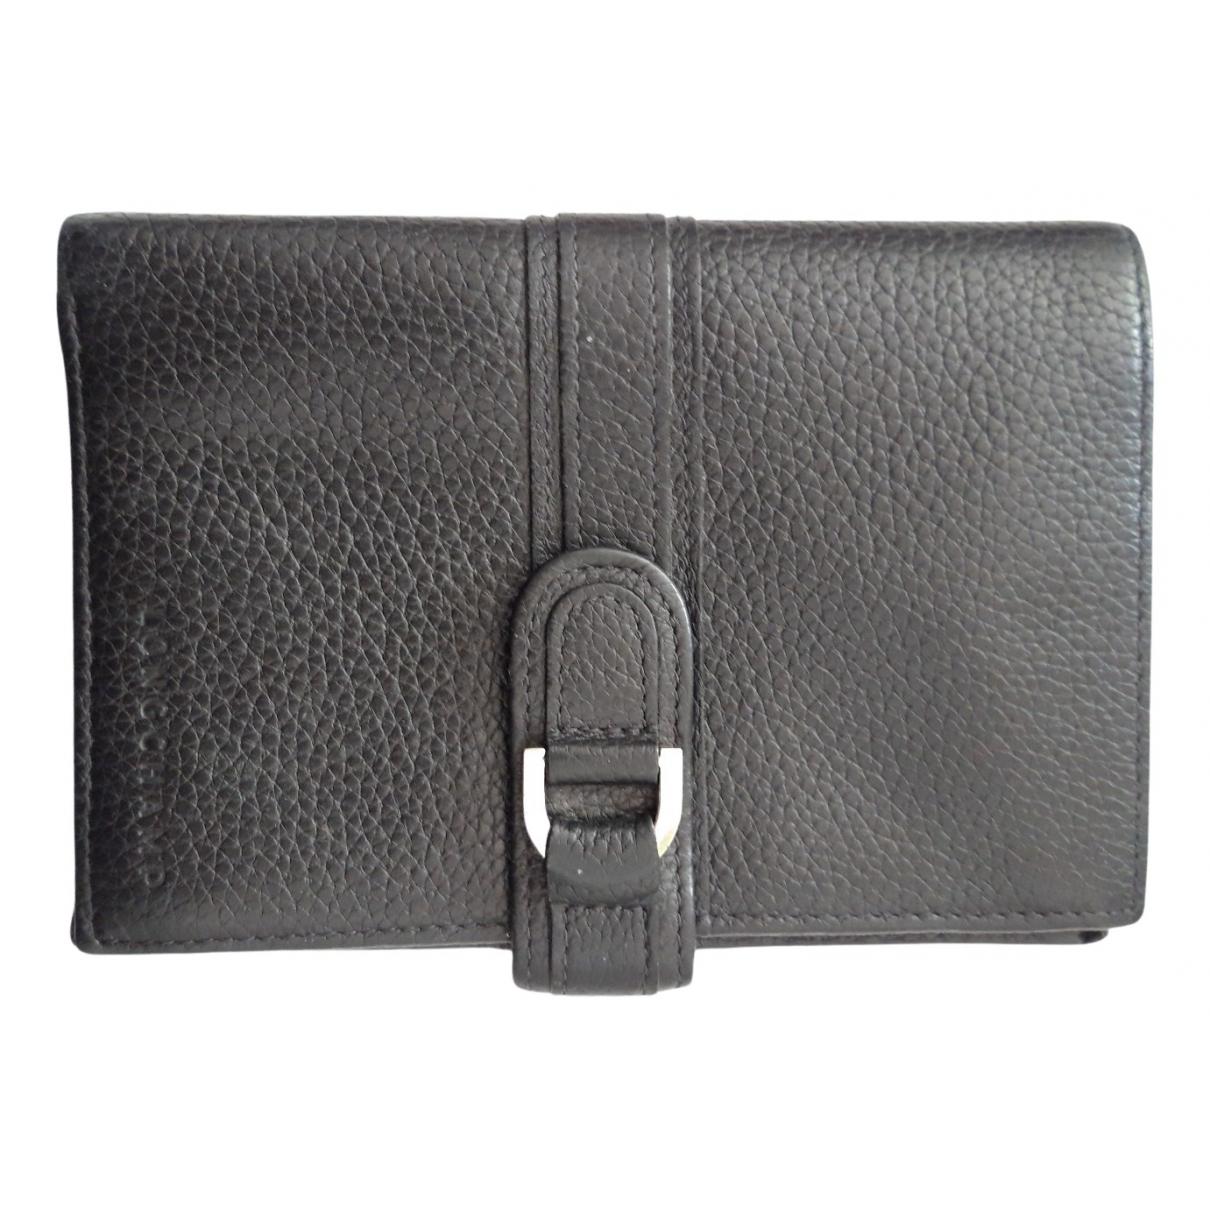 Longchamp \N Kleinlederwaren in  Schwarz Leder